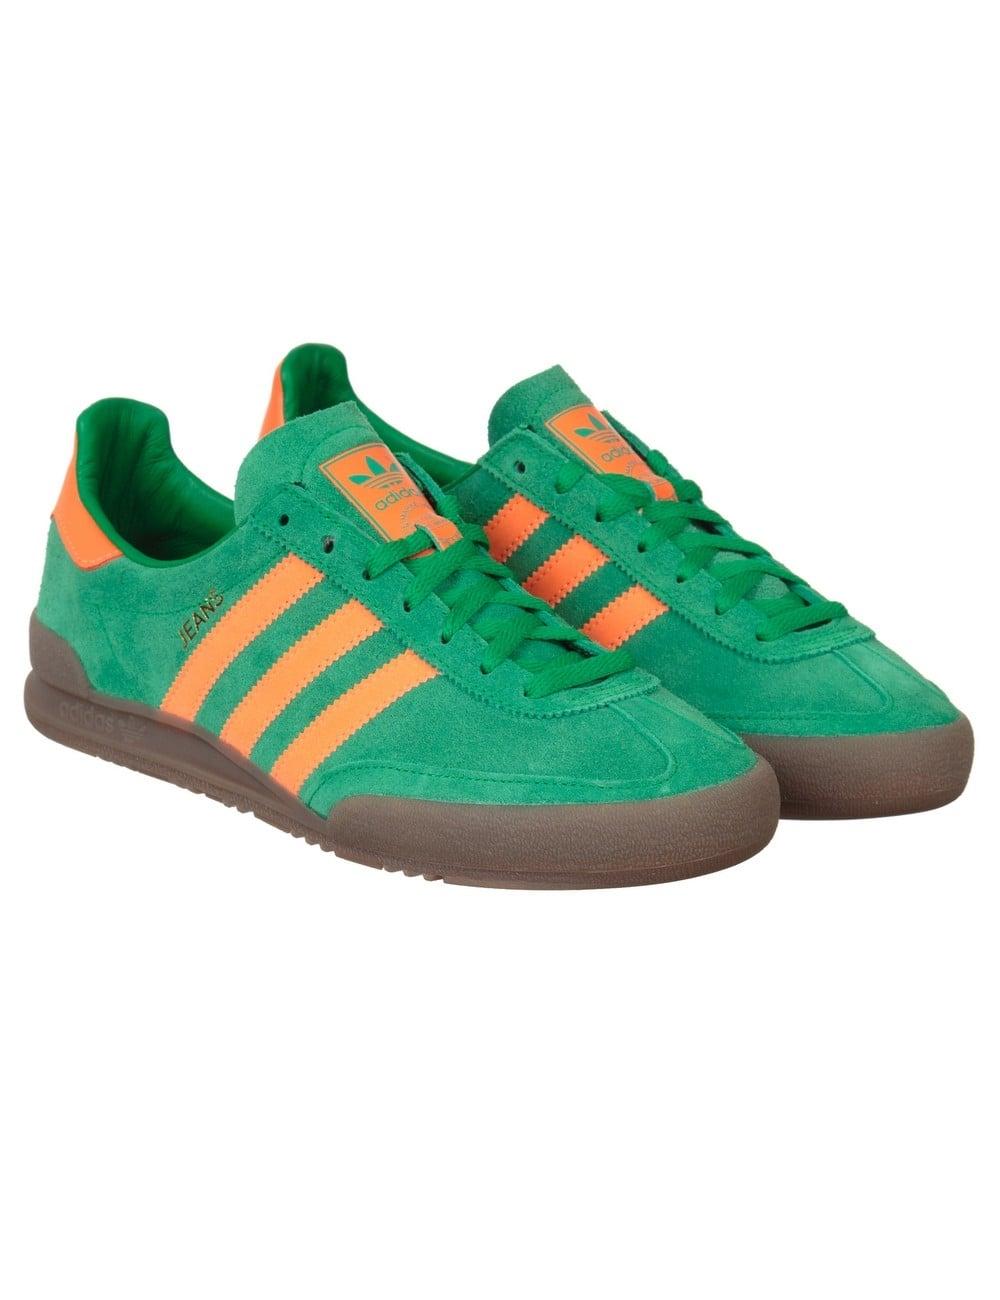 disco atractivo amante  Adidas Originals Jeans Shoes OG - Green/Solar Orange - Footwear from Fat  Buddha Store UK